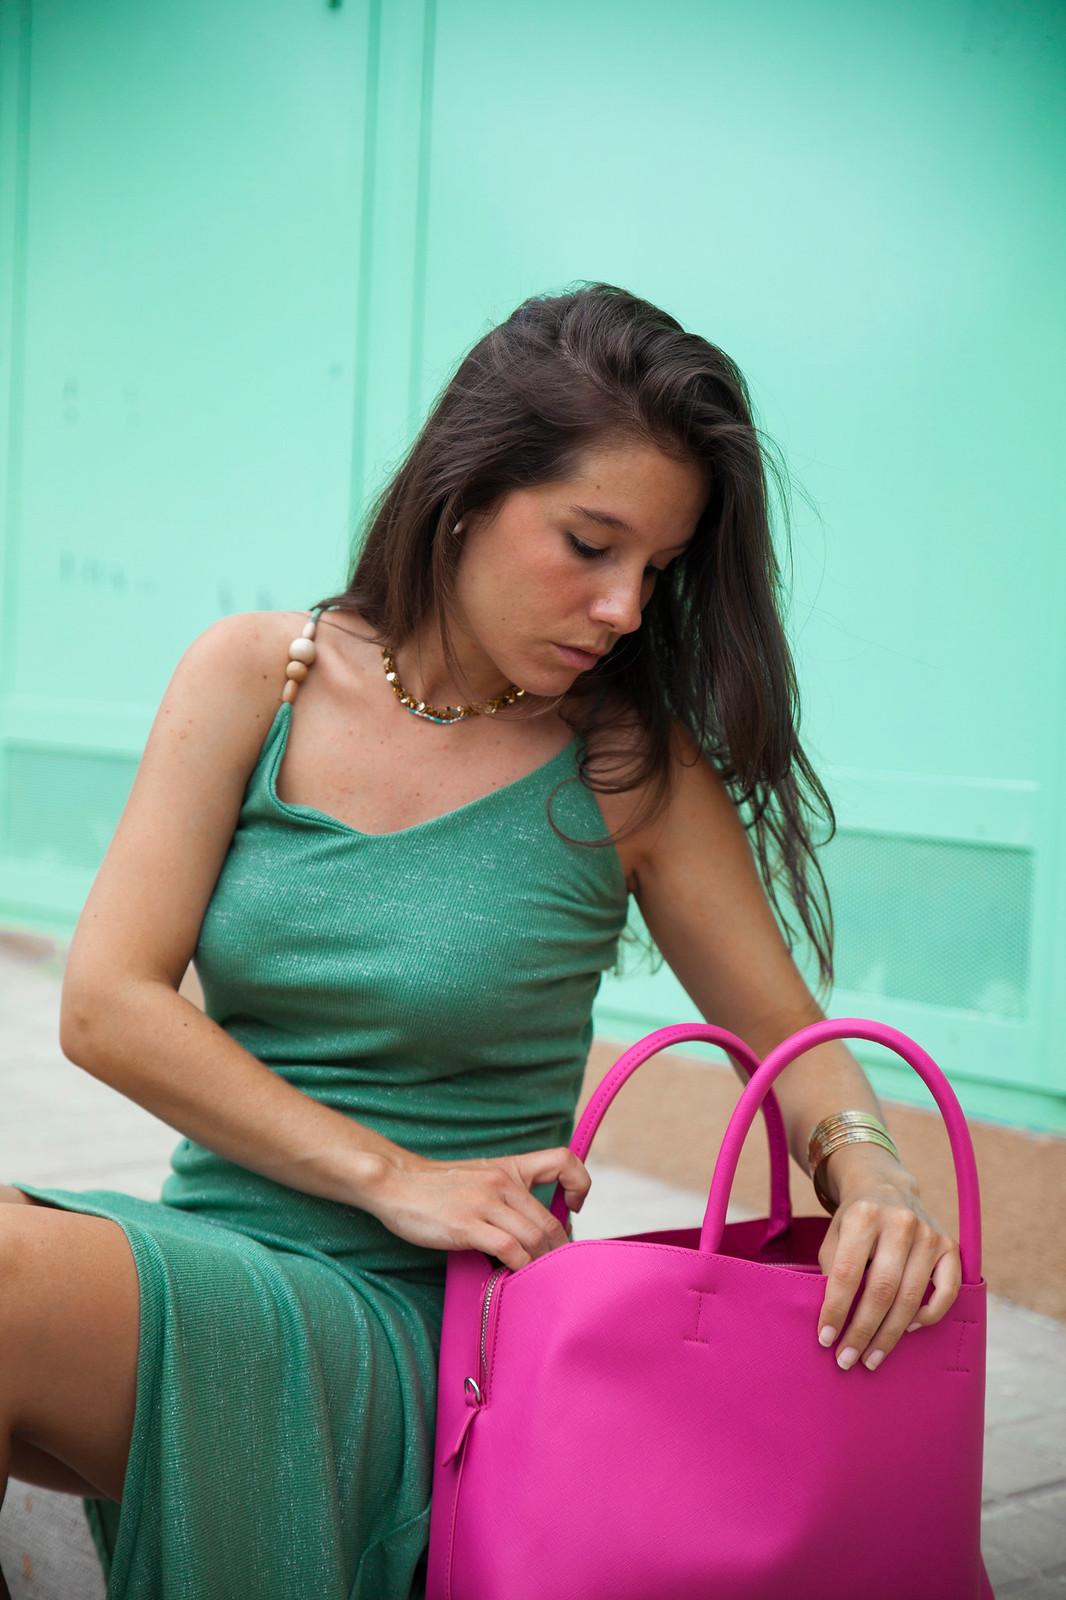 07_Vestido_turquesa_largo_outfit_embarazada_influencer_barcelona_theguestgirl_fiji_water